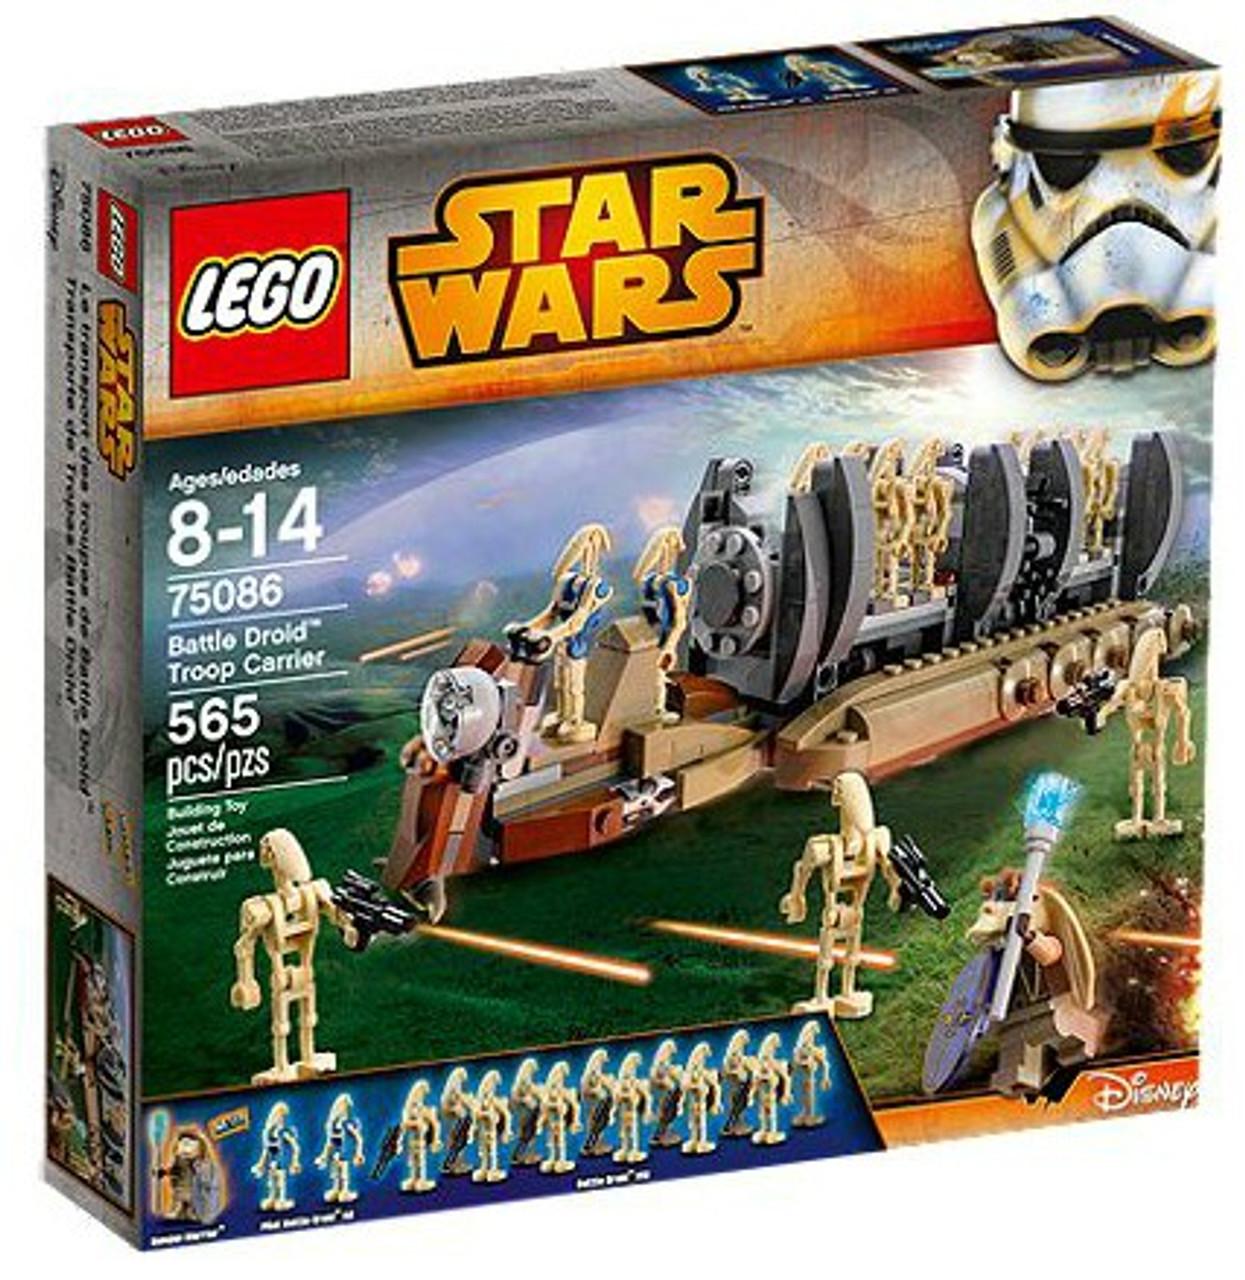 LEGO Star Wars The Phantom Menace Battle Droid Troop Carrier Exclusive Set #75086